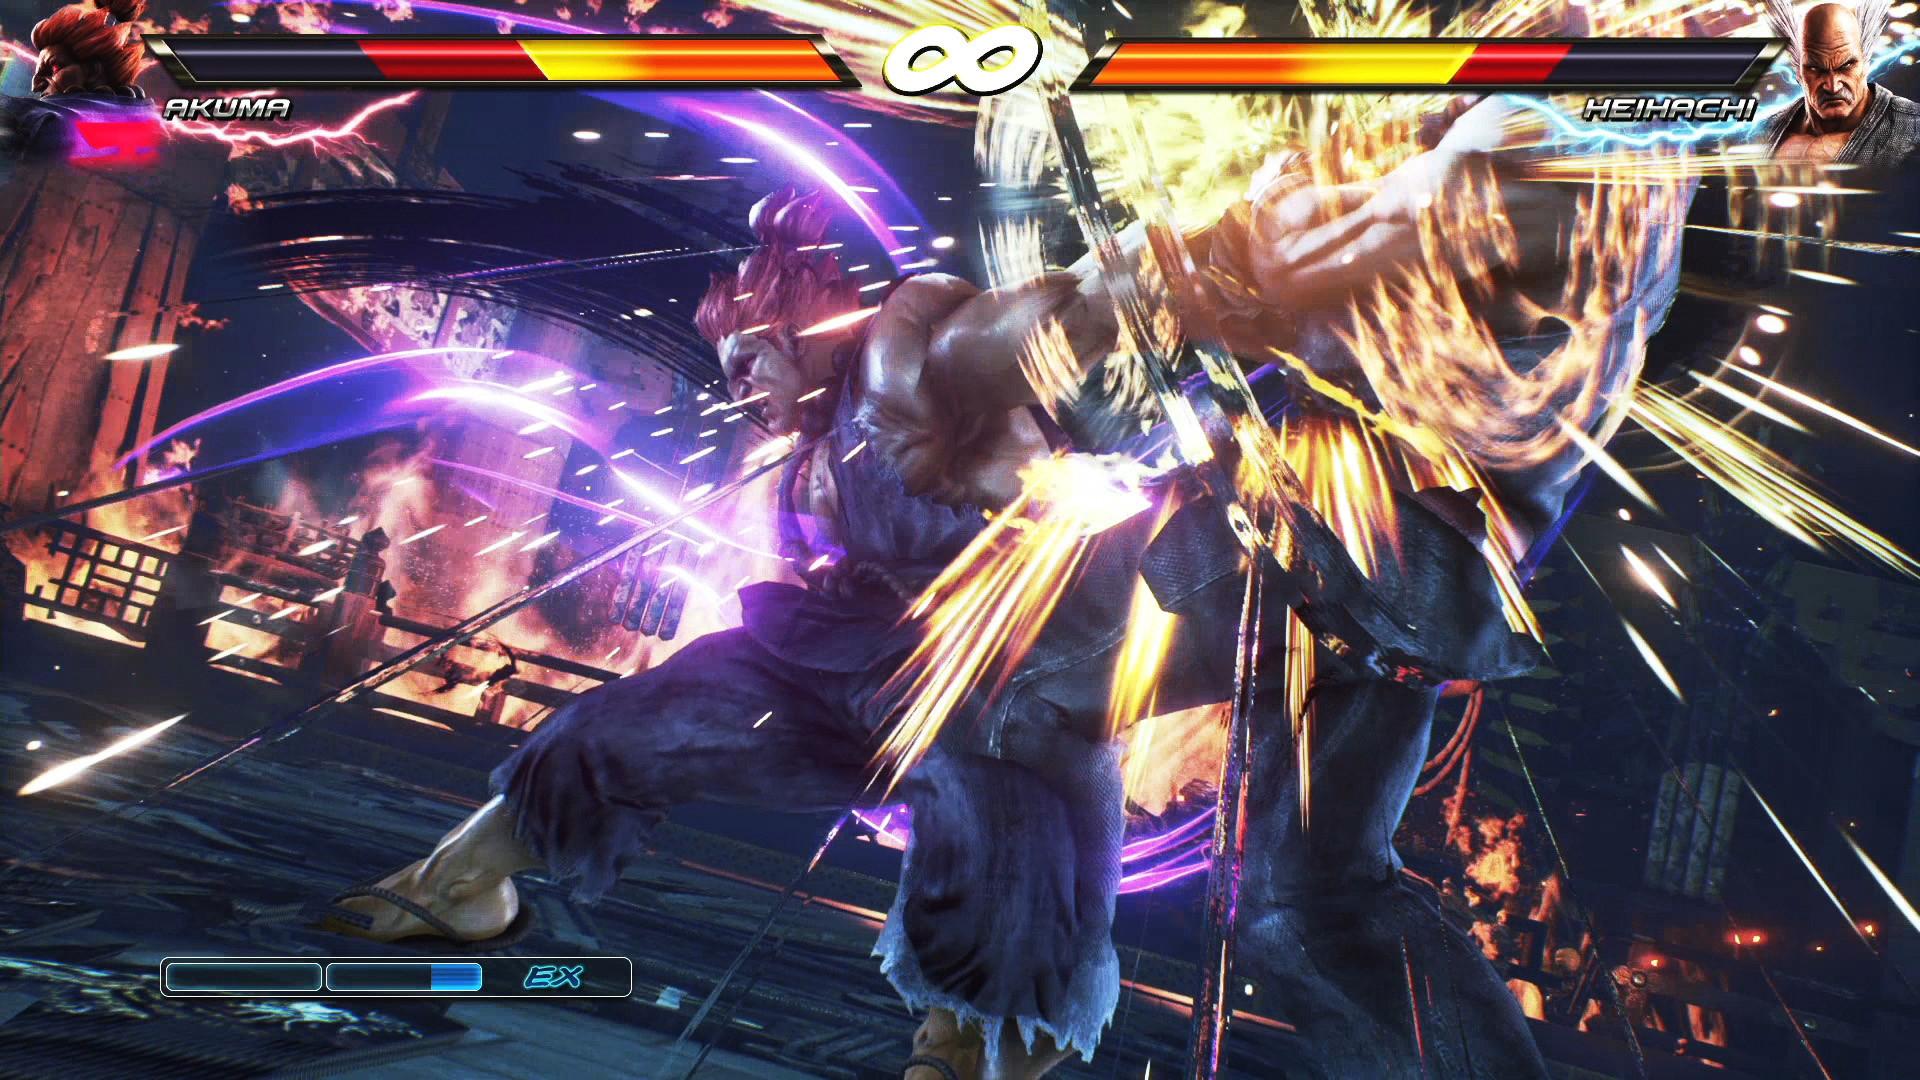 Tekken online matchmaking